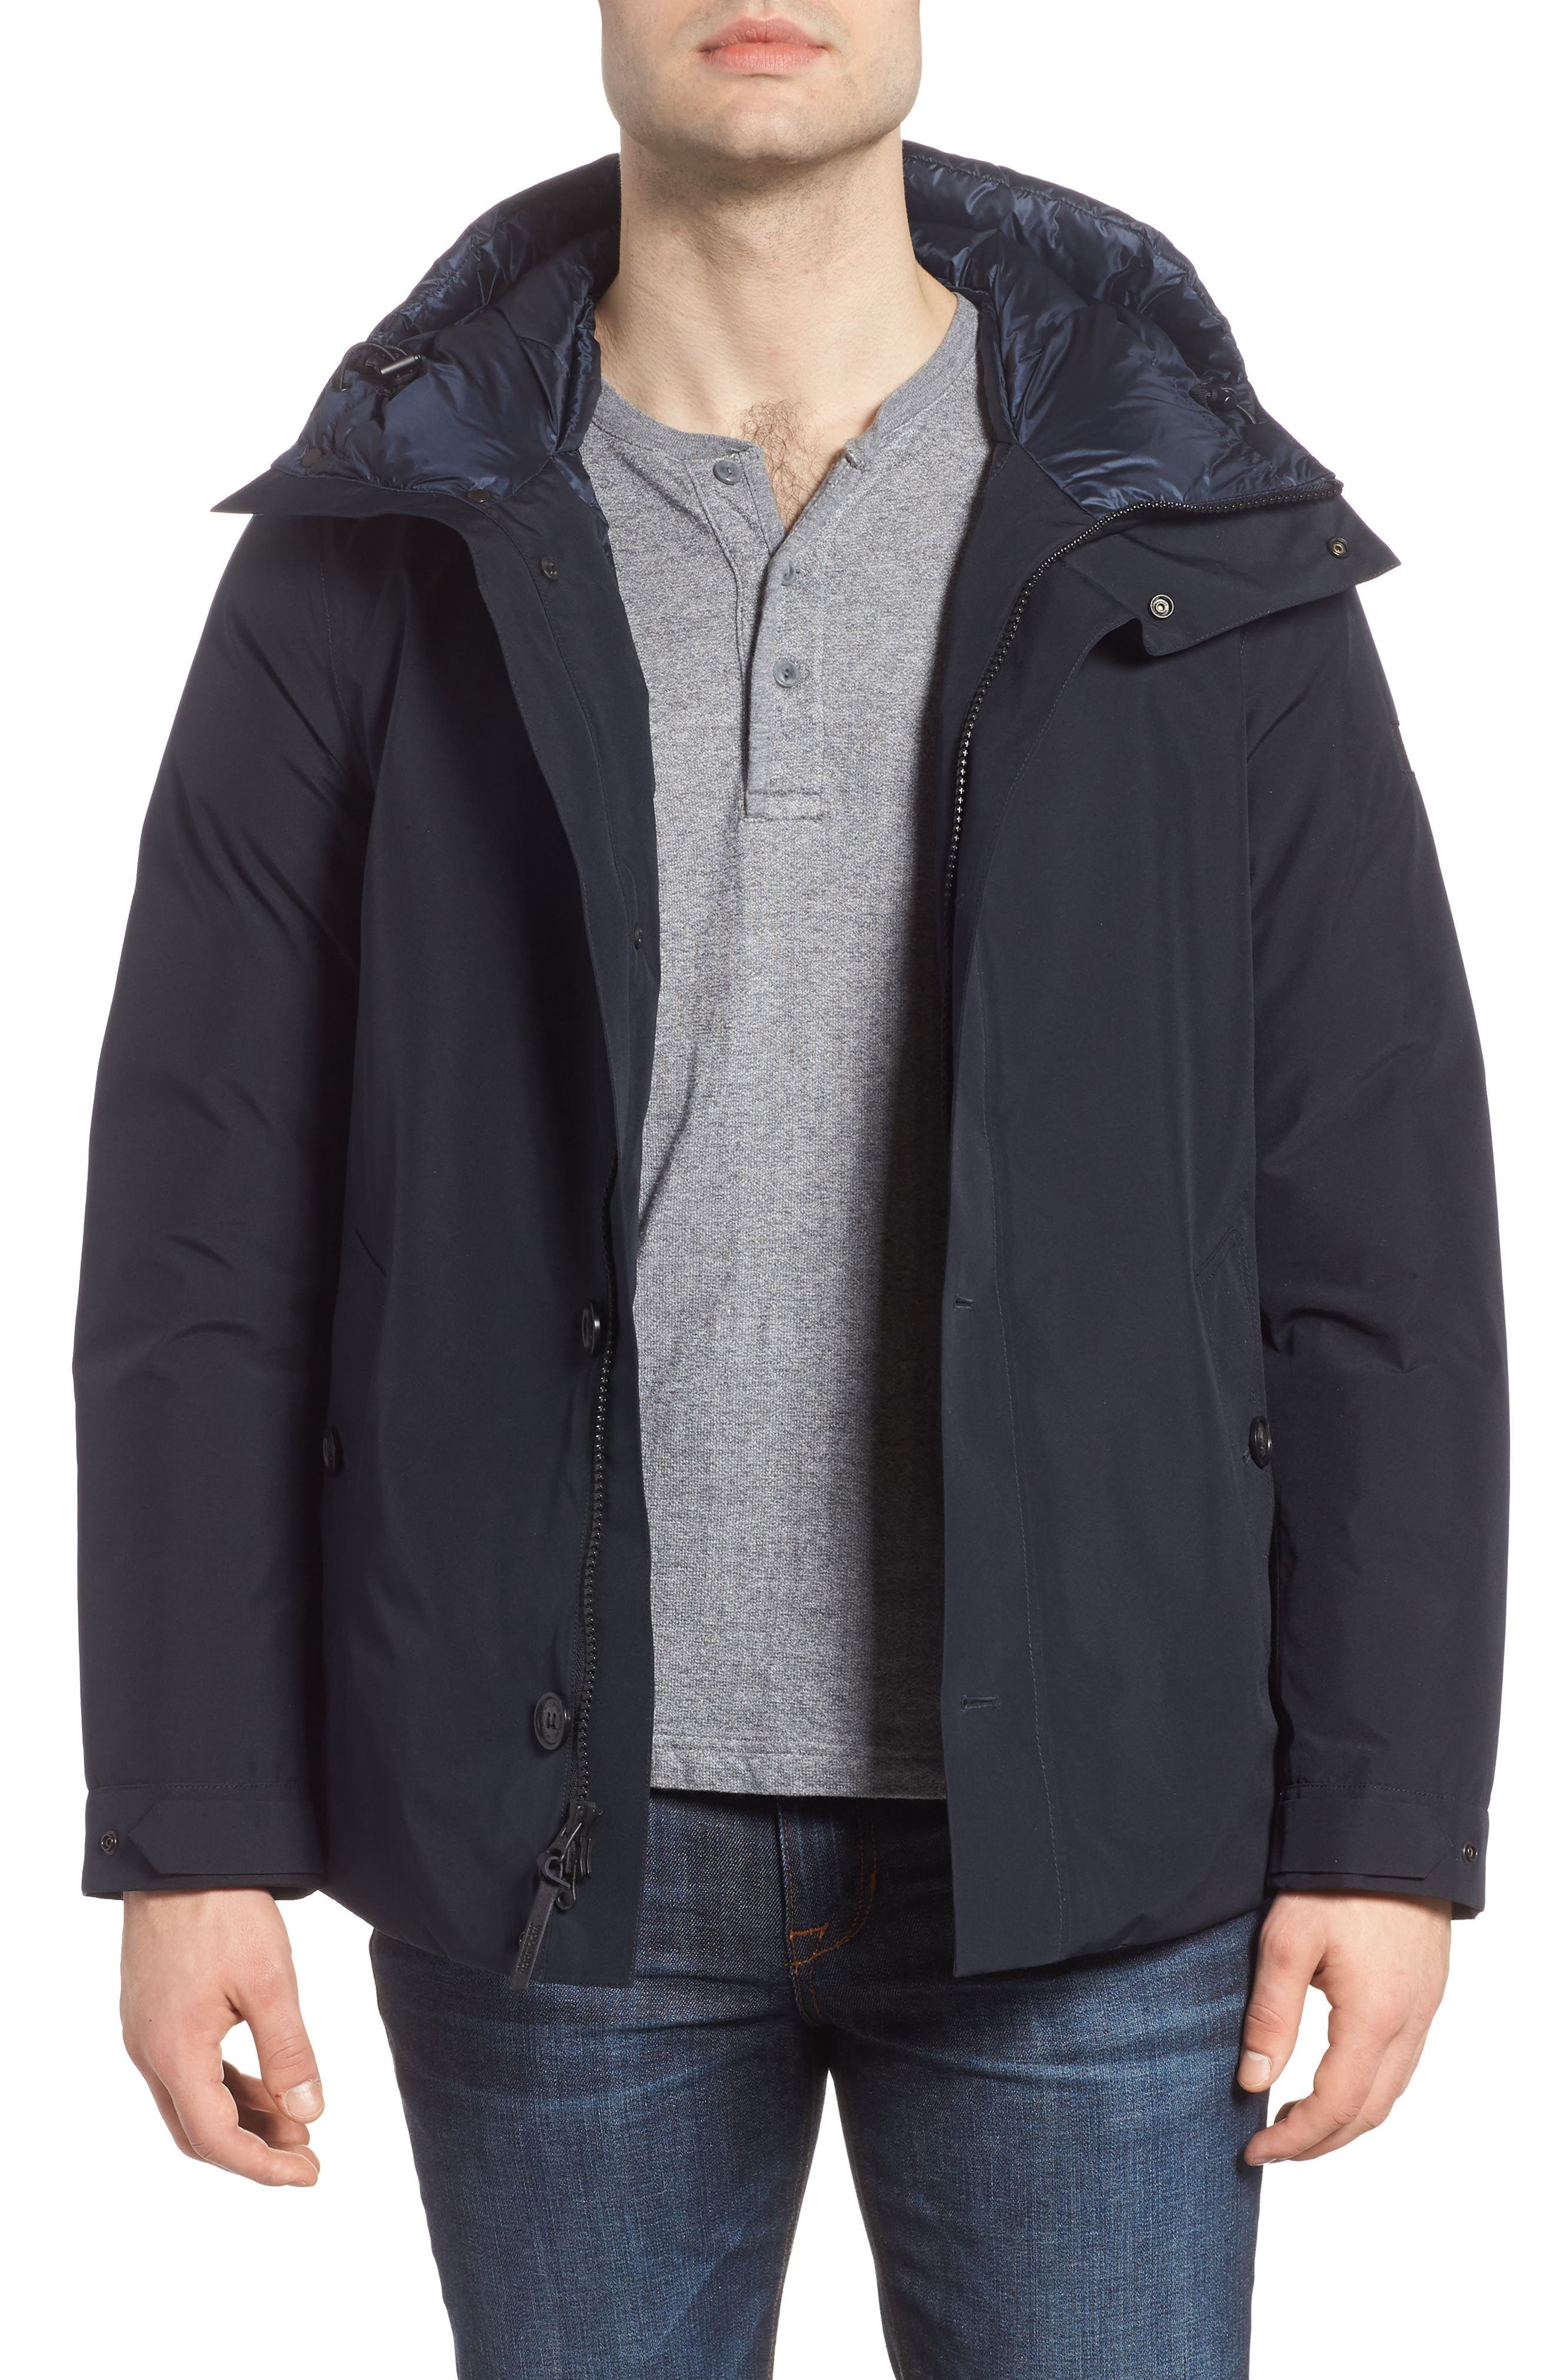 Waterproof Gore-Tex<sup>®</sup> Alpine Jacket,                         Main,                         color, NAVY MELTON